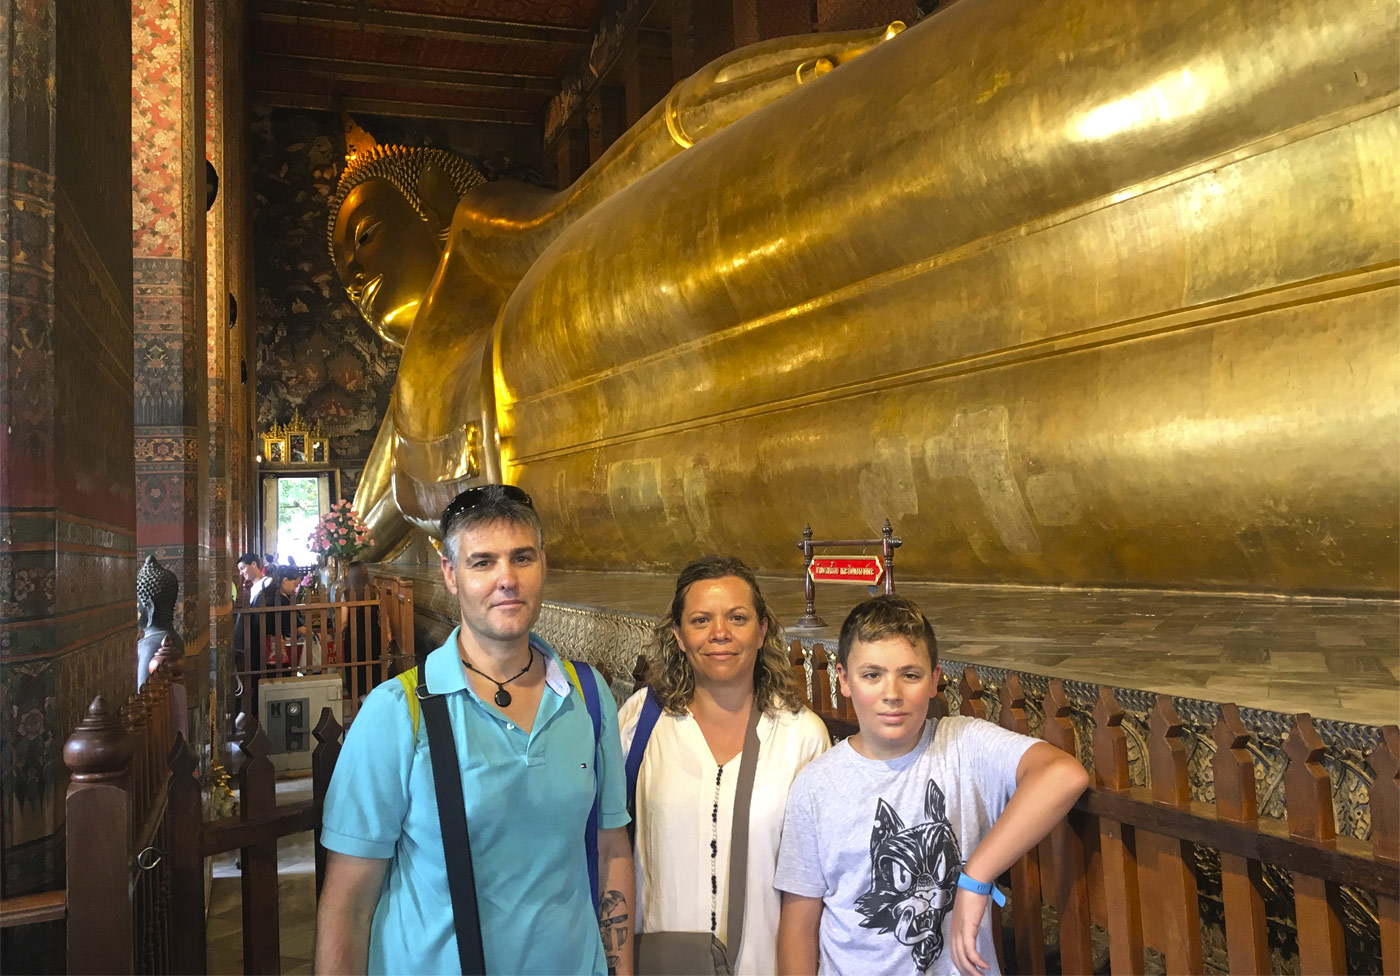 Thailandia, buda reclinado, Tailandia